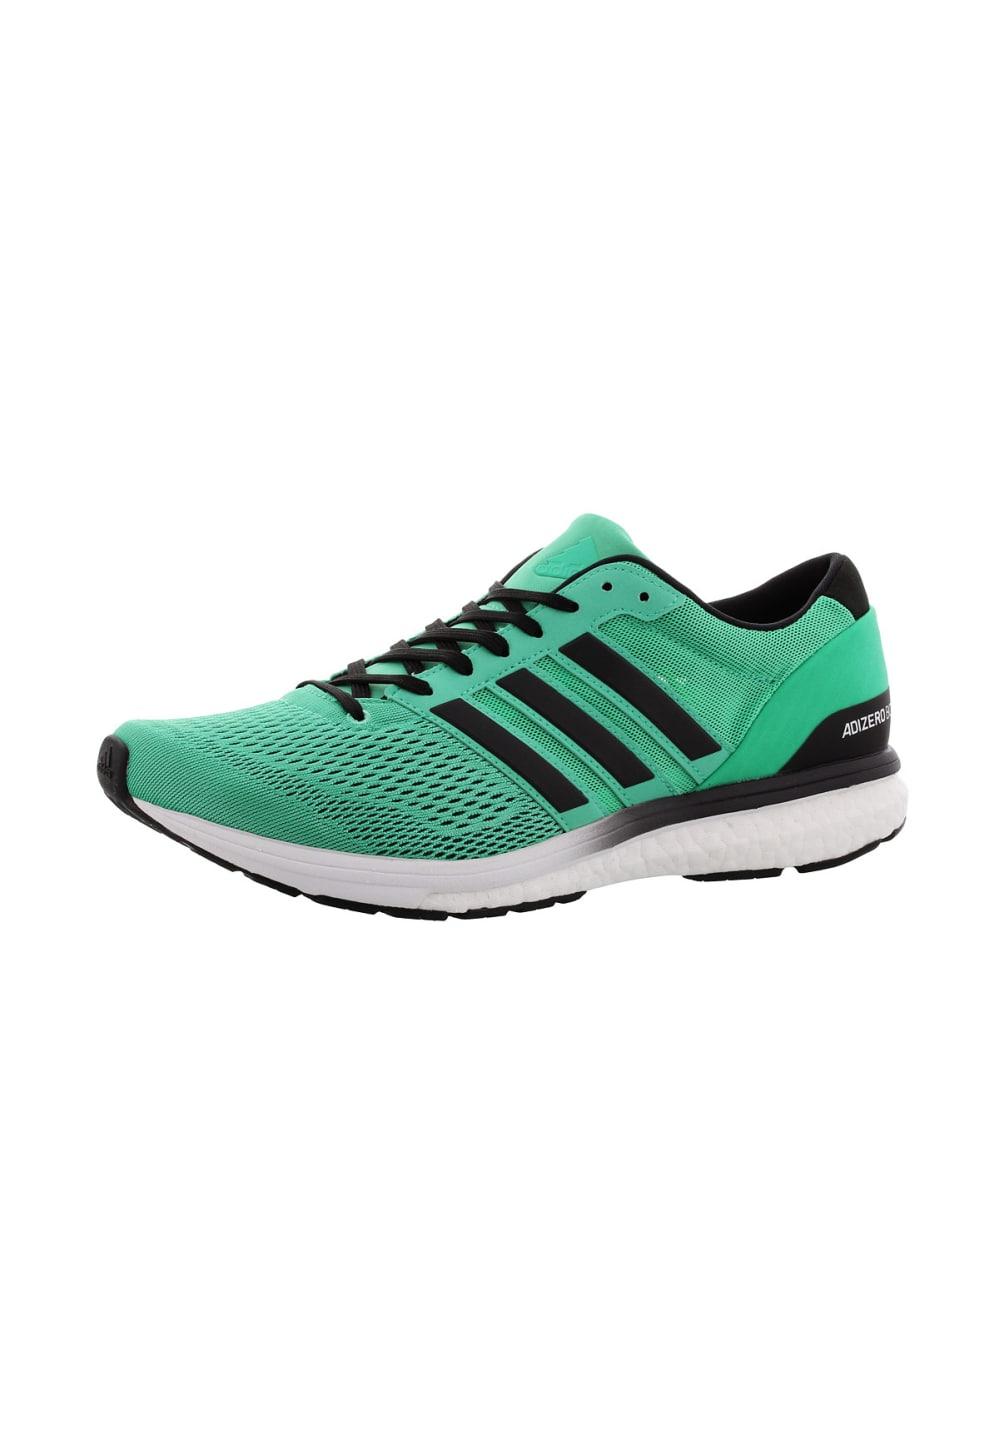 code promo b385e 84821 adidas Adizero Boston 6 - Running shoes for Men - Green